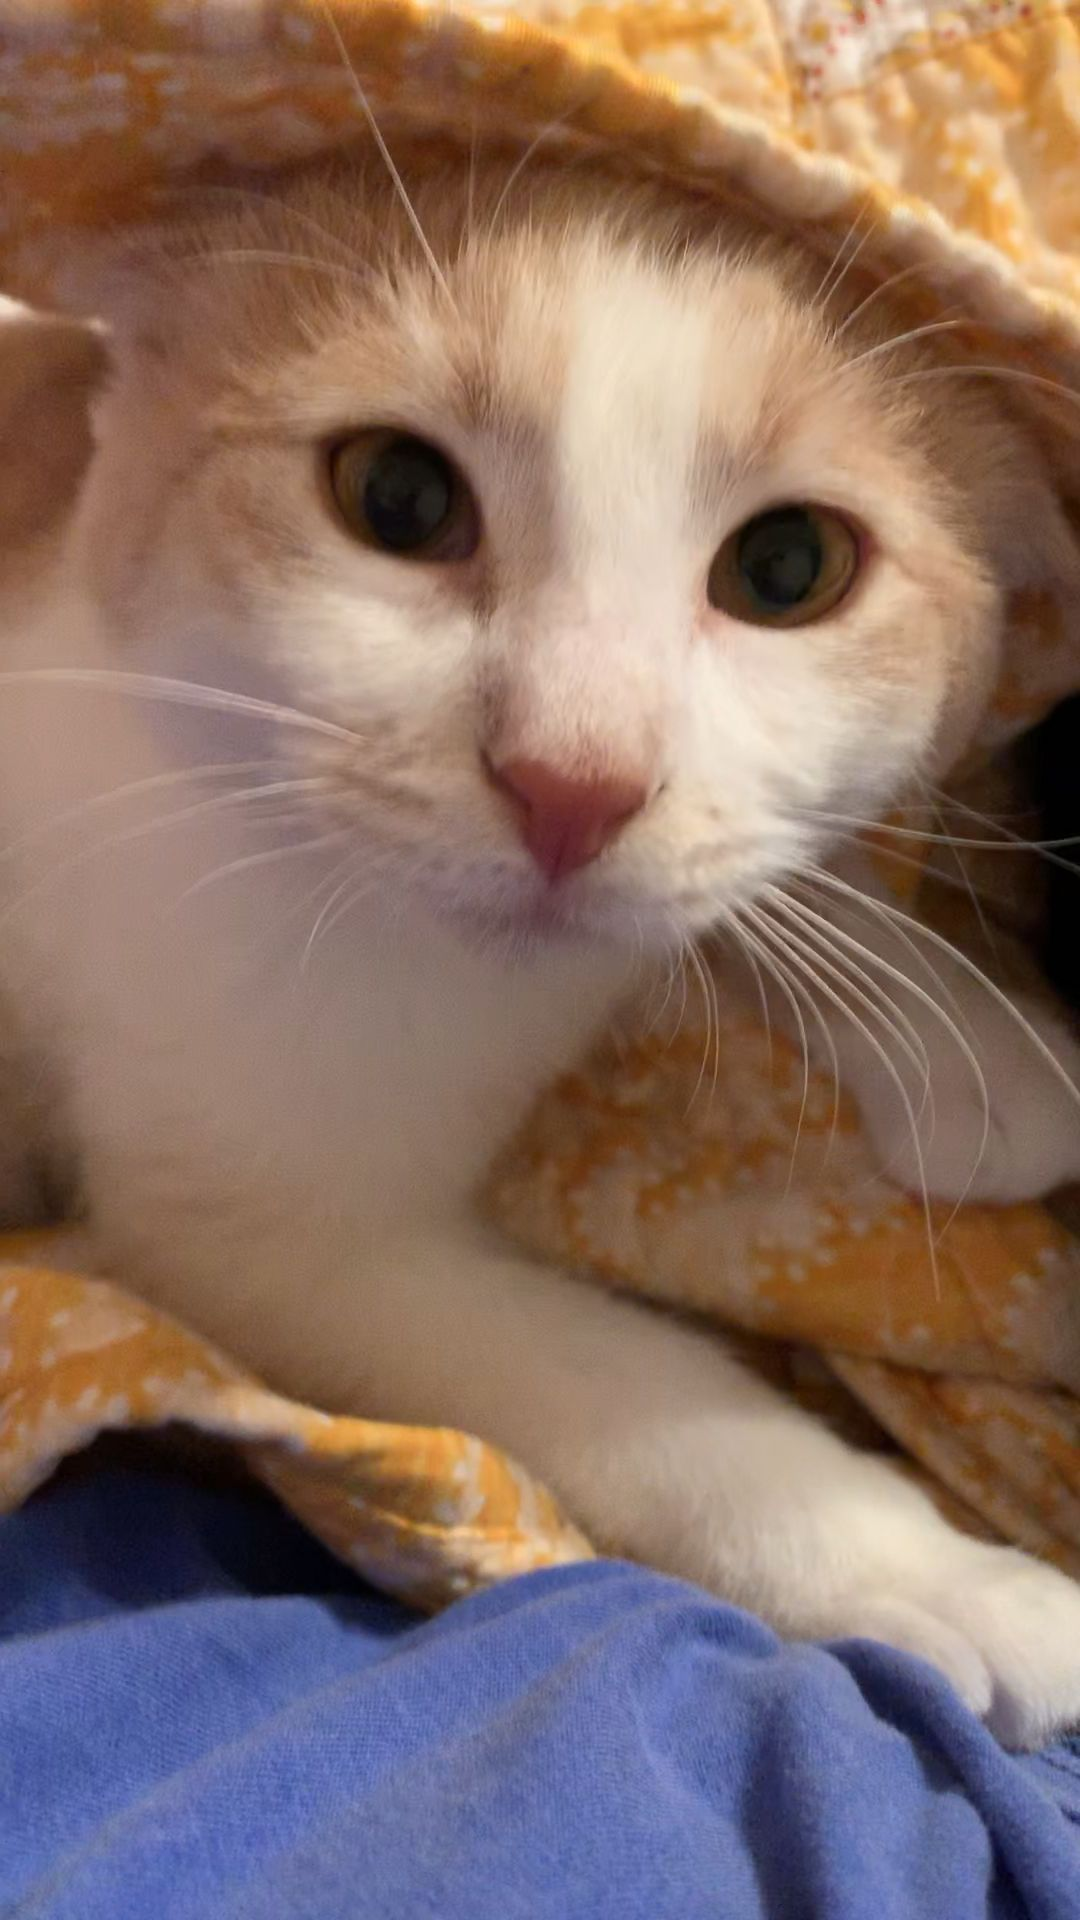 Pin By Jade Nunes On Gatitos In 2020 Cute Cat Gif Cute Animal Photos Baby Animals